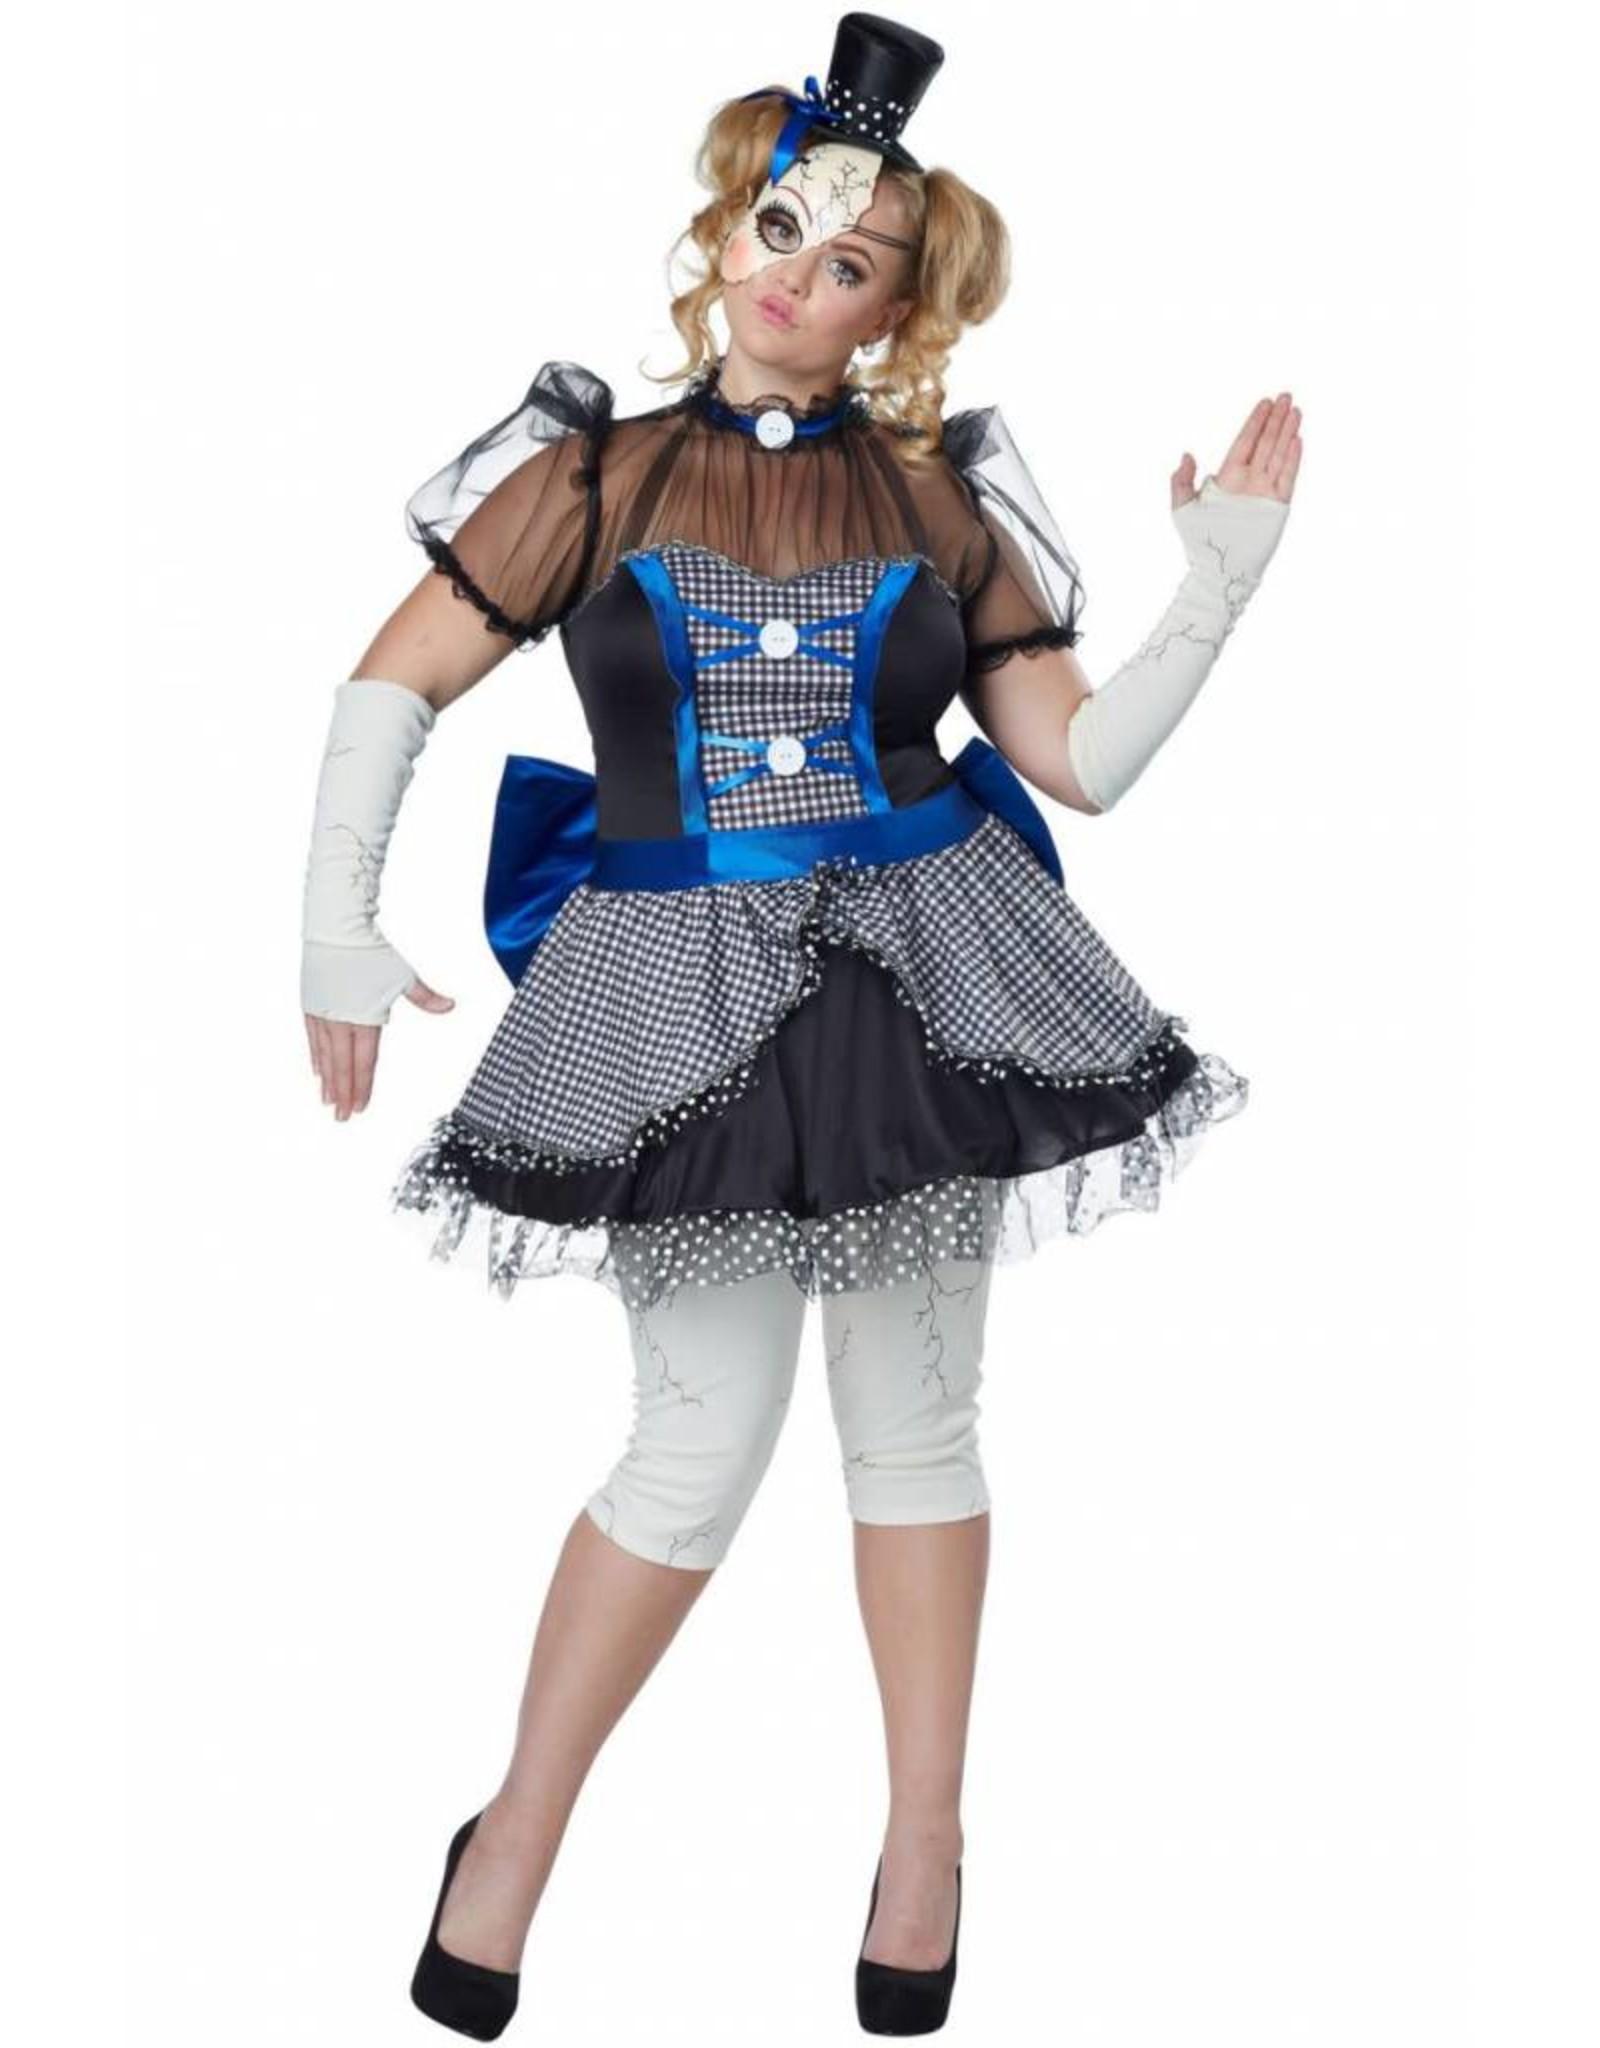 California Costume Twisted Babydoll 1X